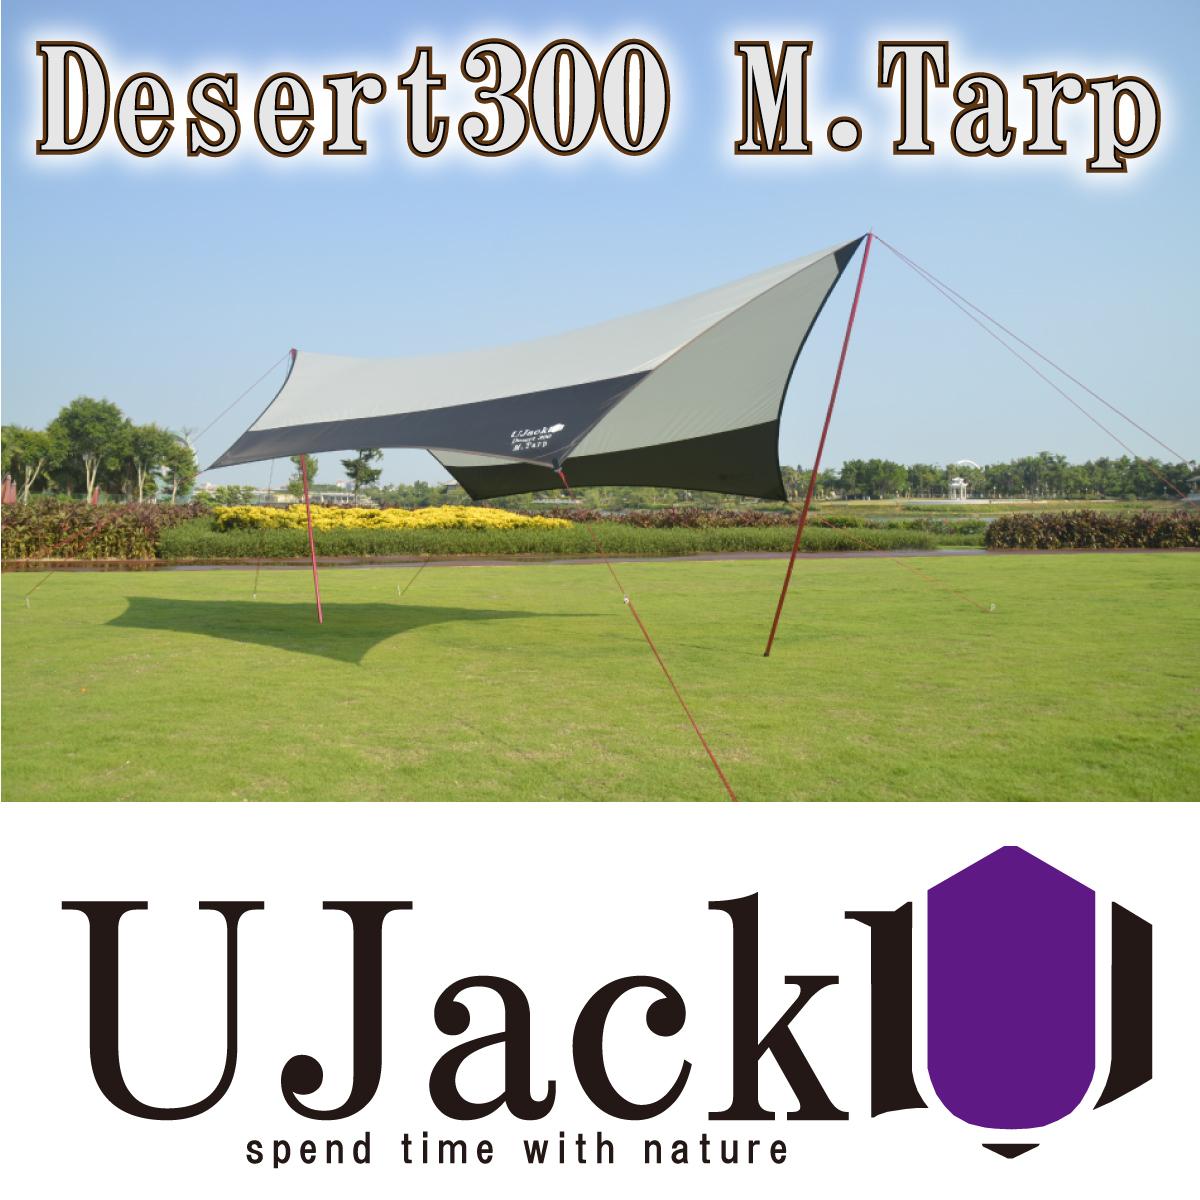 UJack(ユージャック) タープ Desert300 M.Tarp全長500cm 99% UVカットテフロン加工